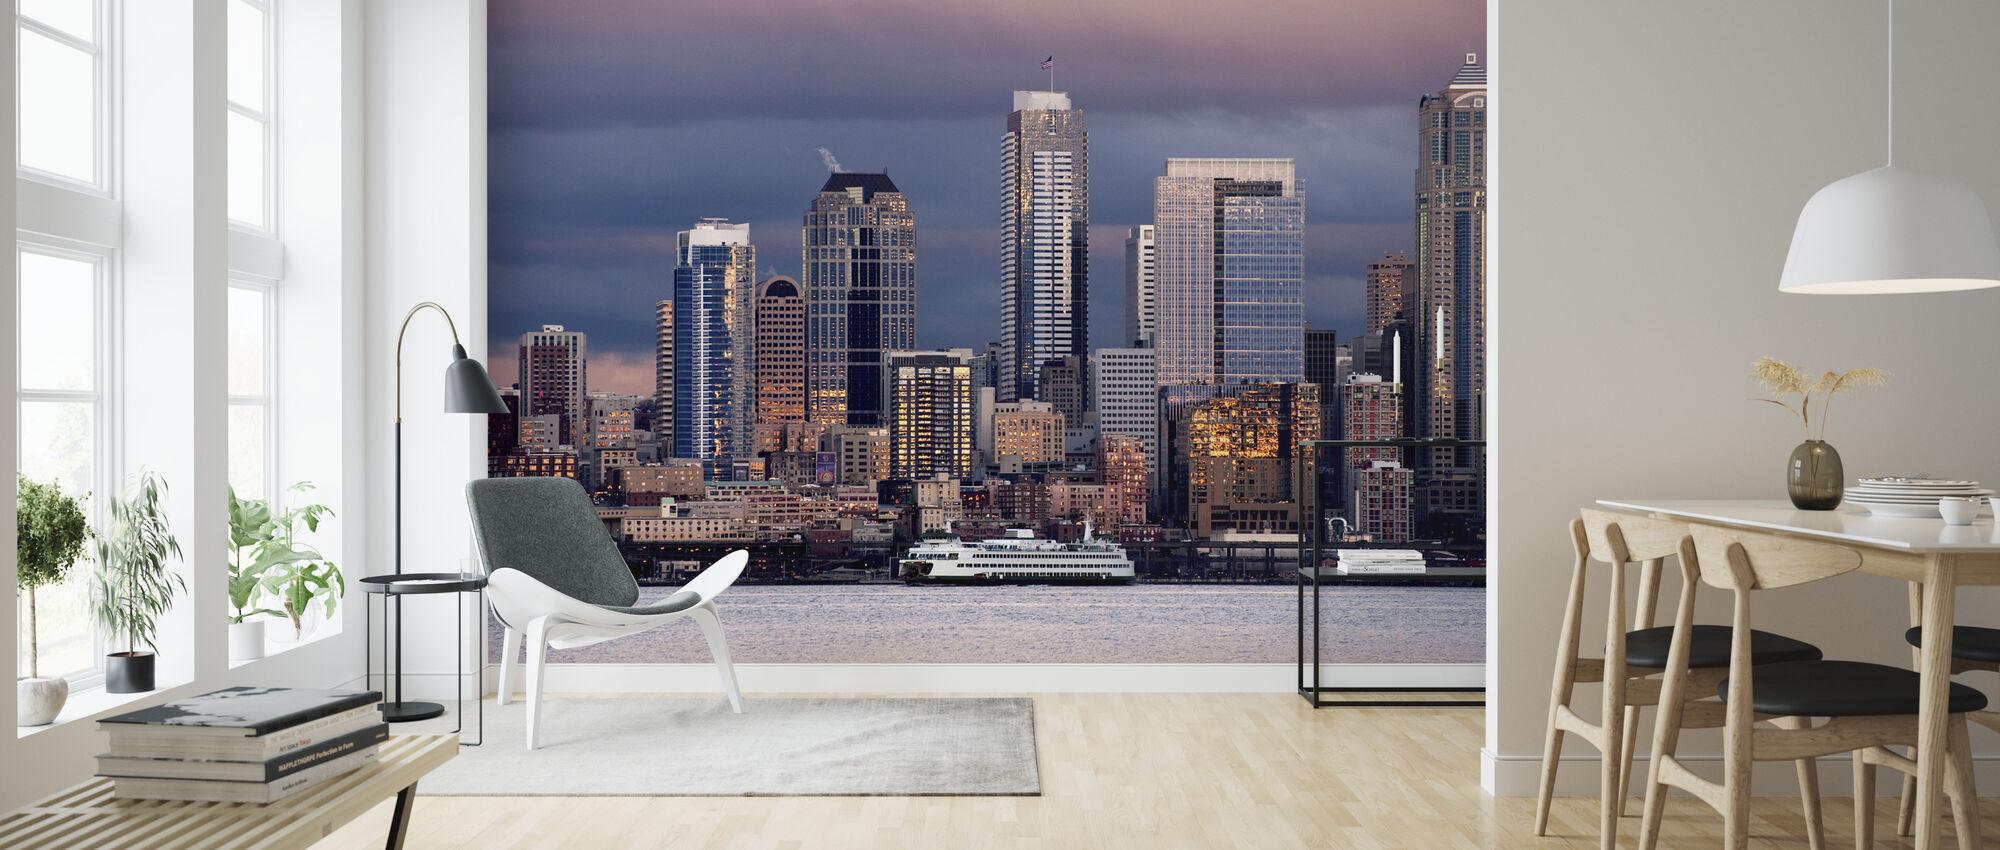 Seattle Silhouette - Wallpaper - Living Room